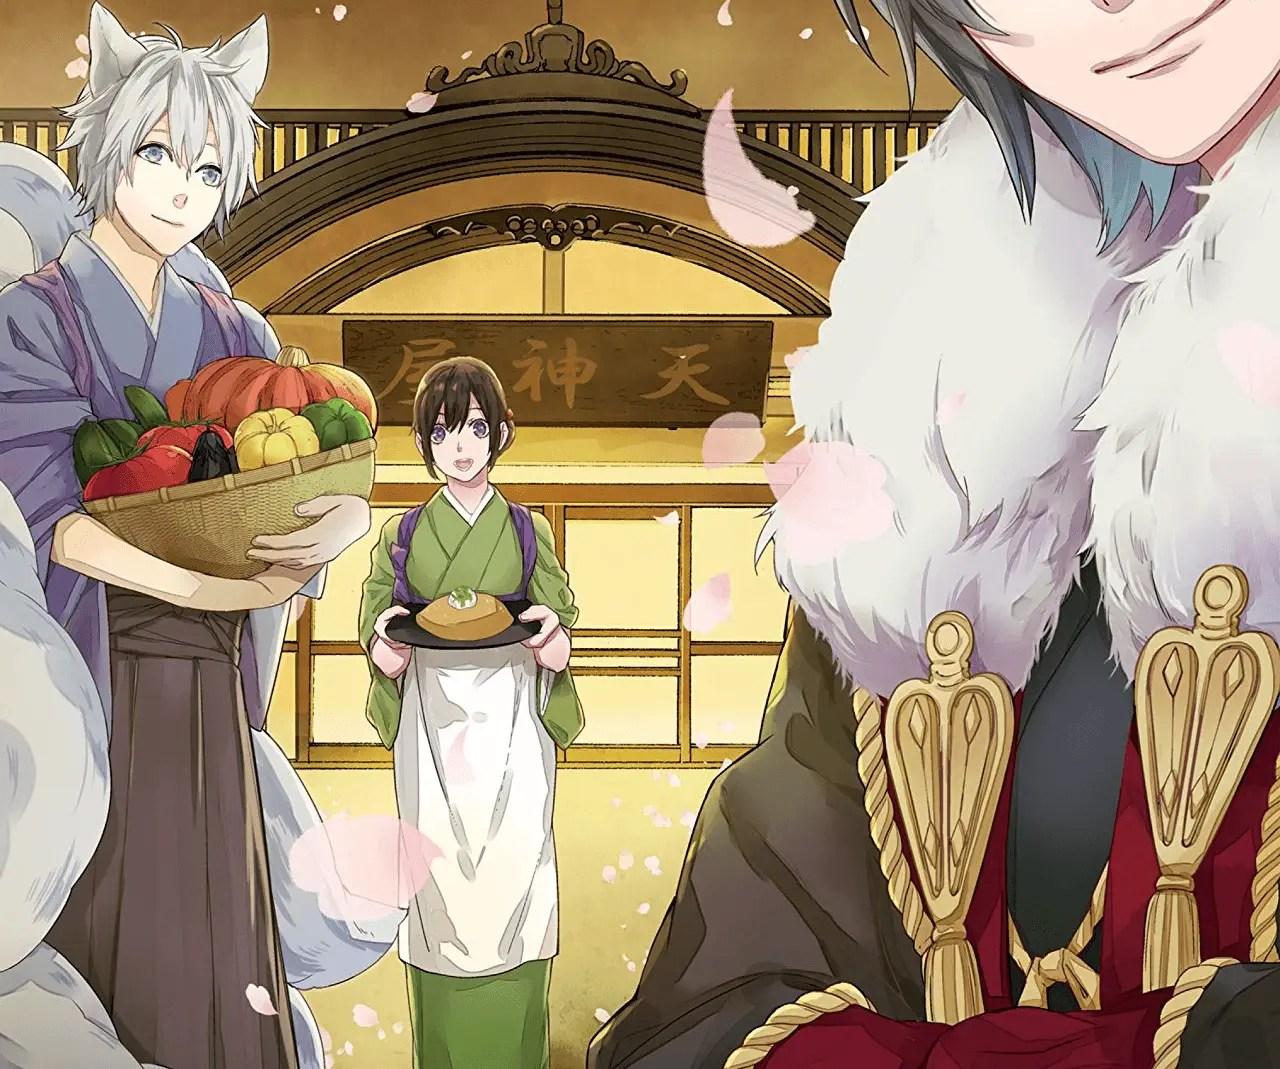 Kakuriyo: Bed & Breakfast for Spirits Vol. 1 Review